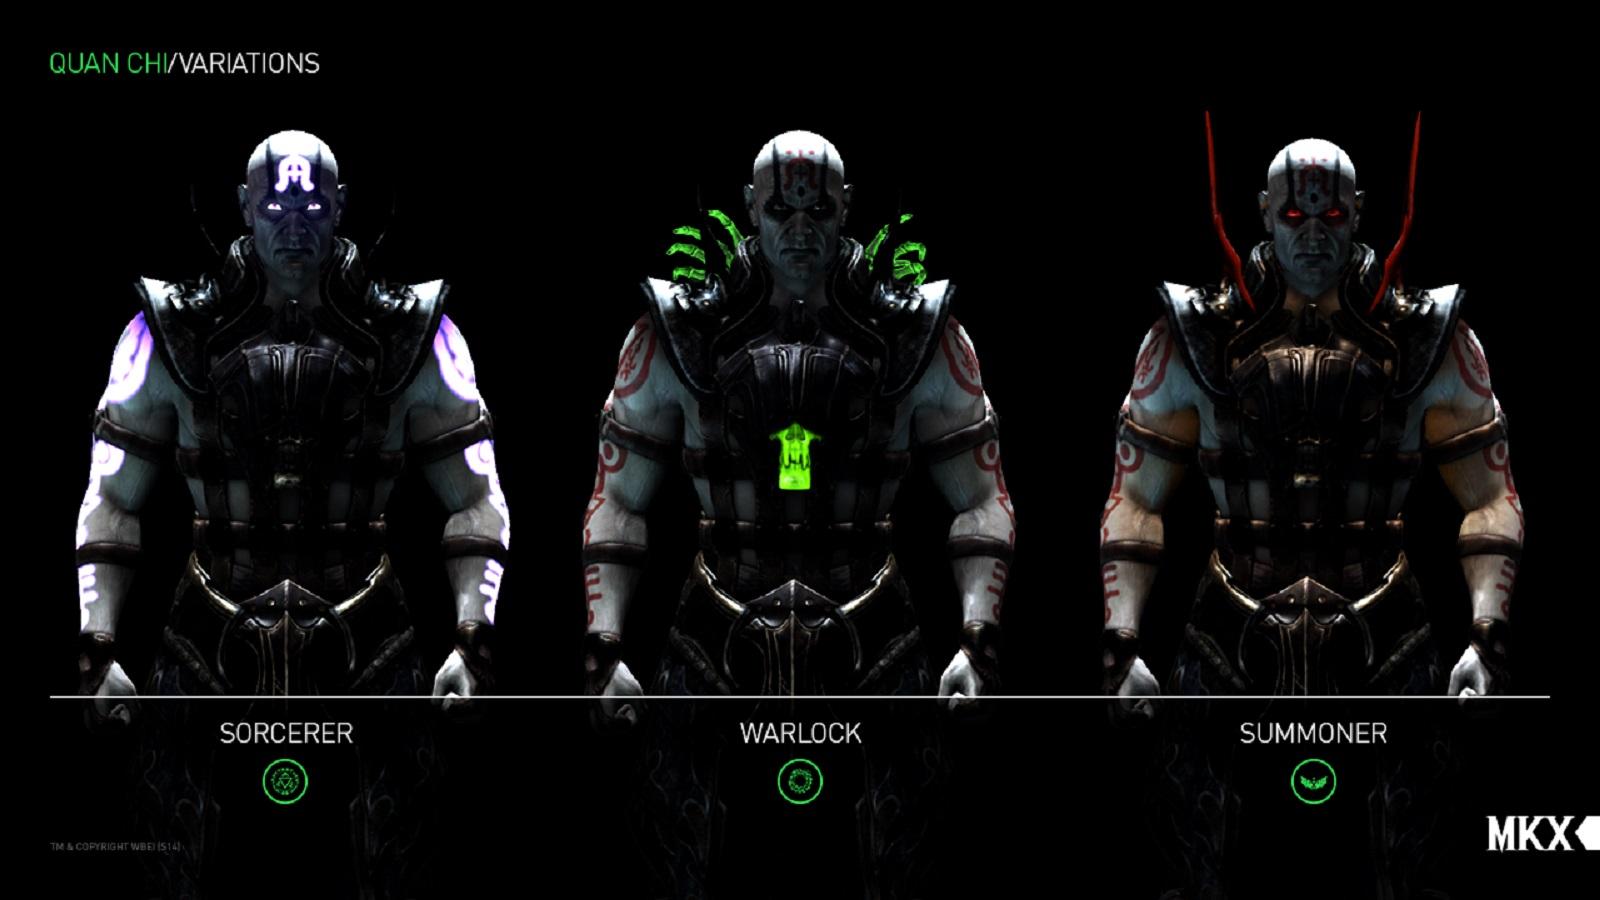 Mortal Kombat X Quan Chi All Variations Character Render As You